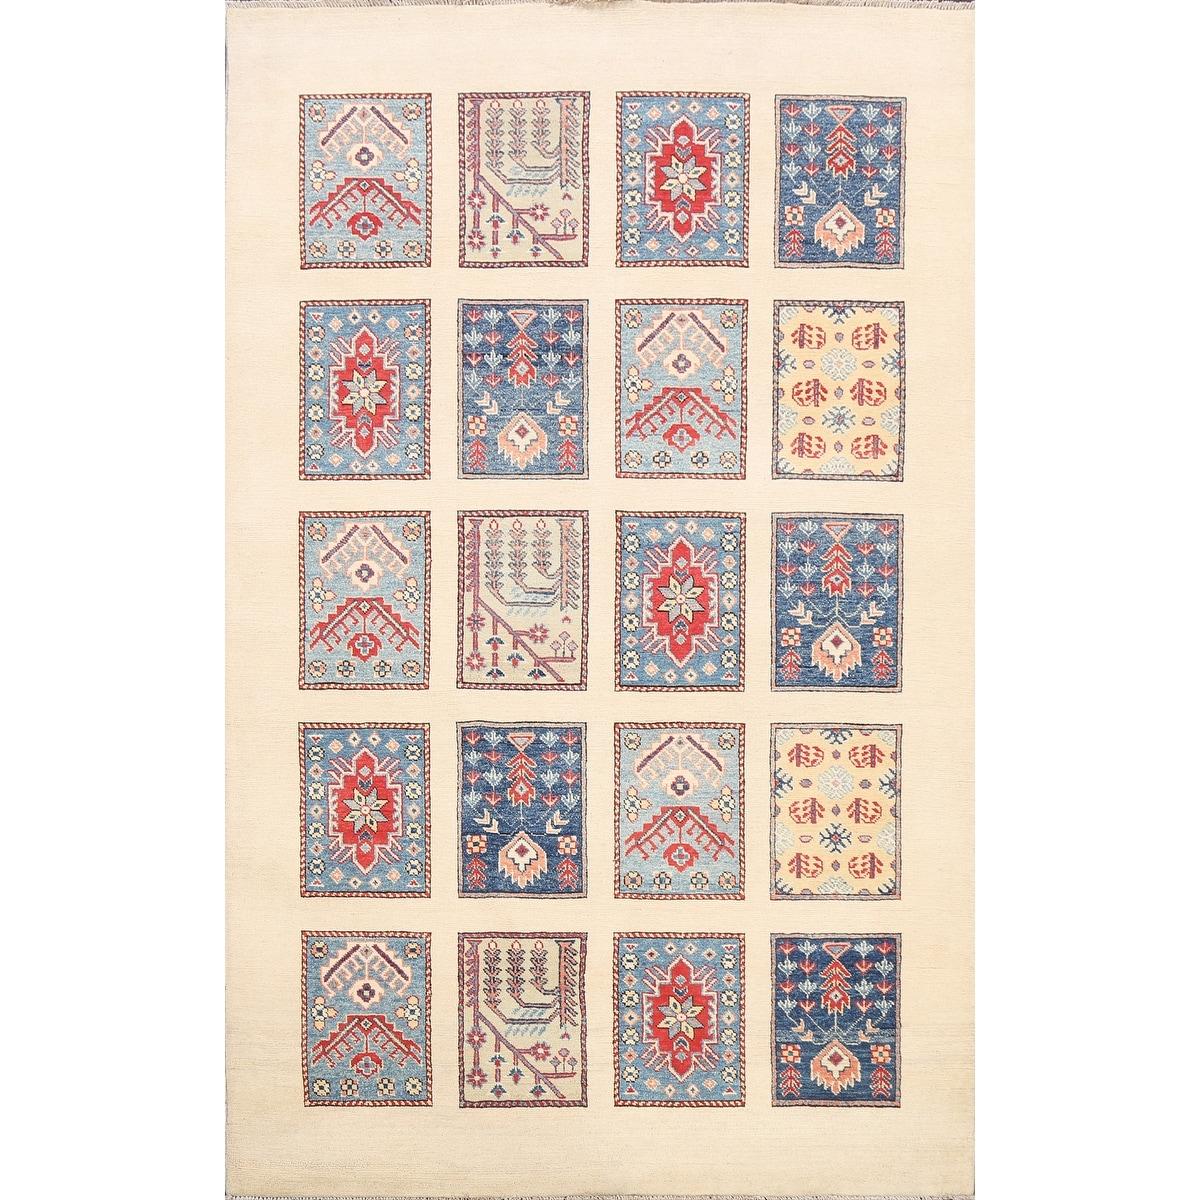 Vegetable Dye Patch-work Super Kazak Oriental Area Rug Wool Handmade - 5'1